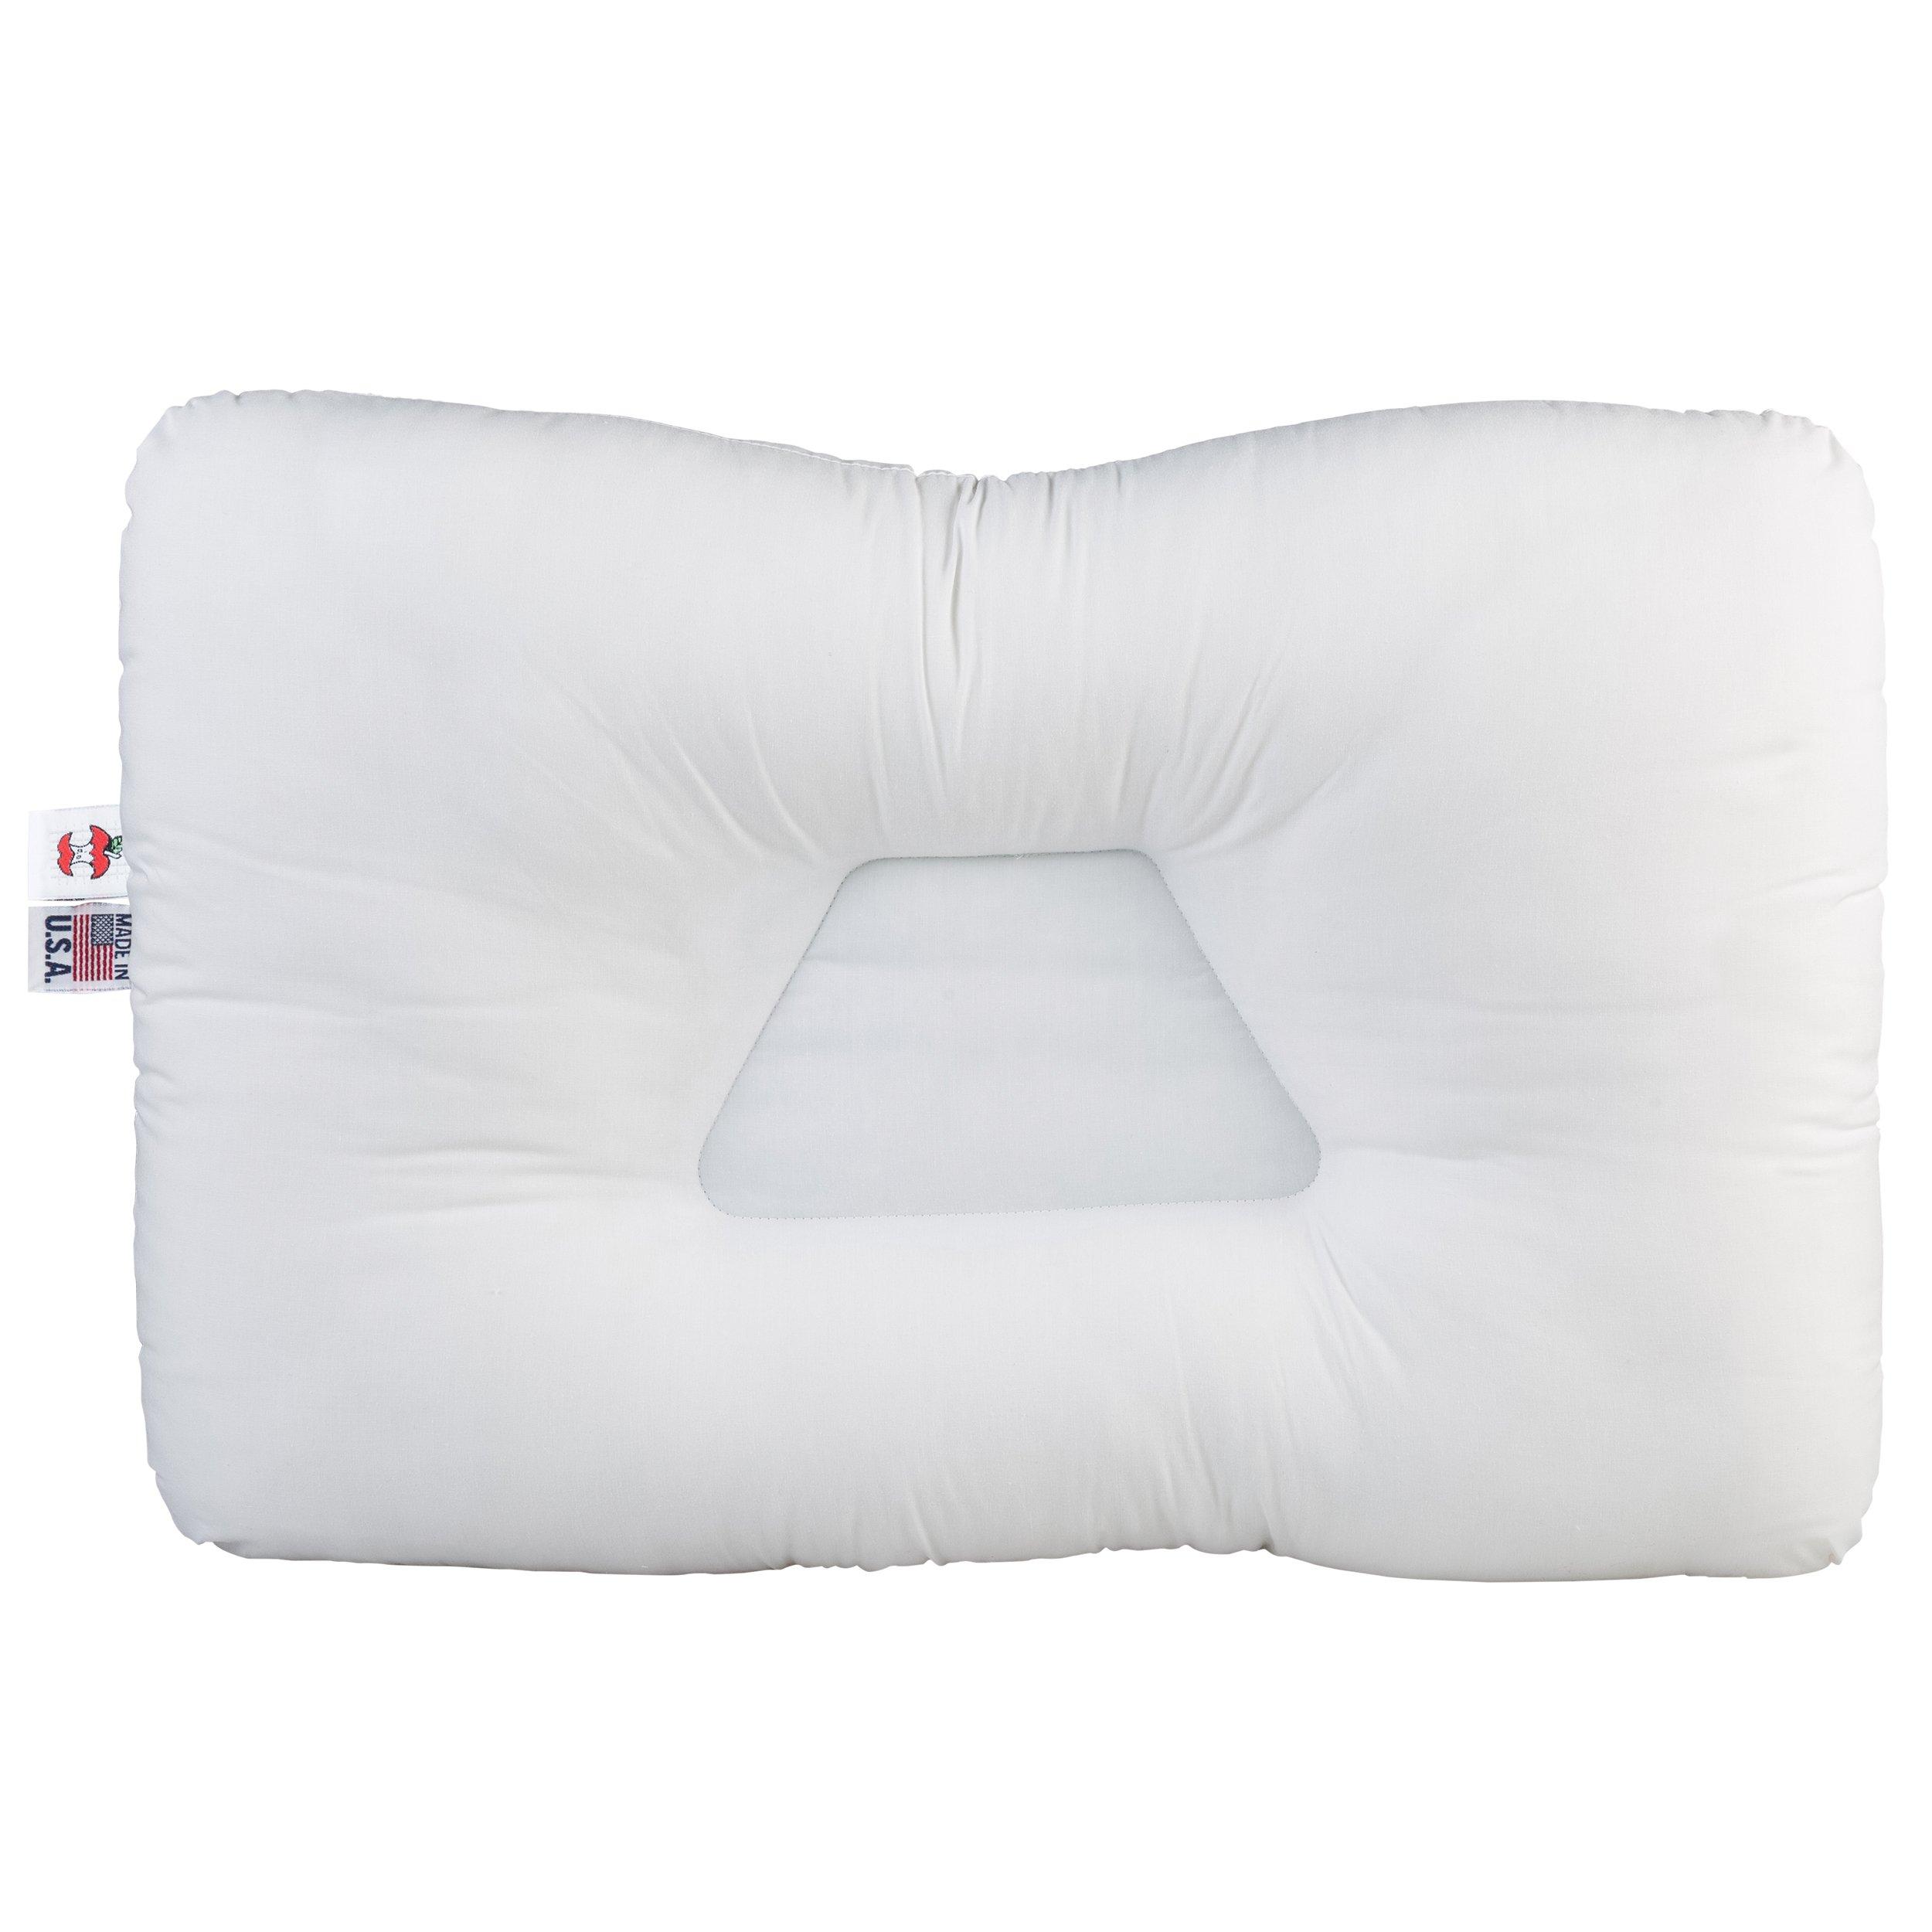 Petite Core Pillow Firm - White